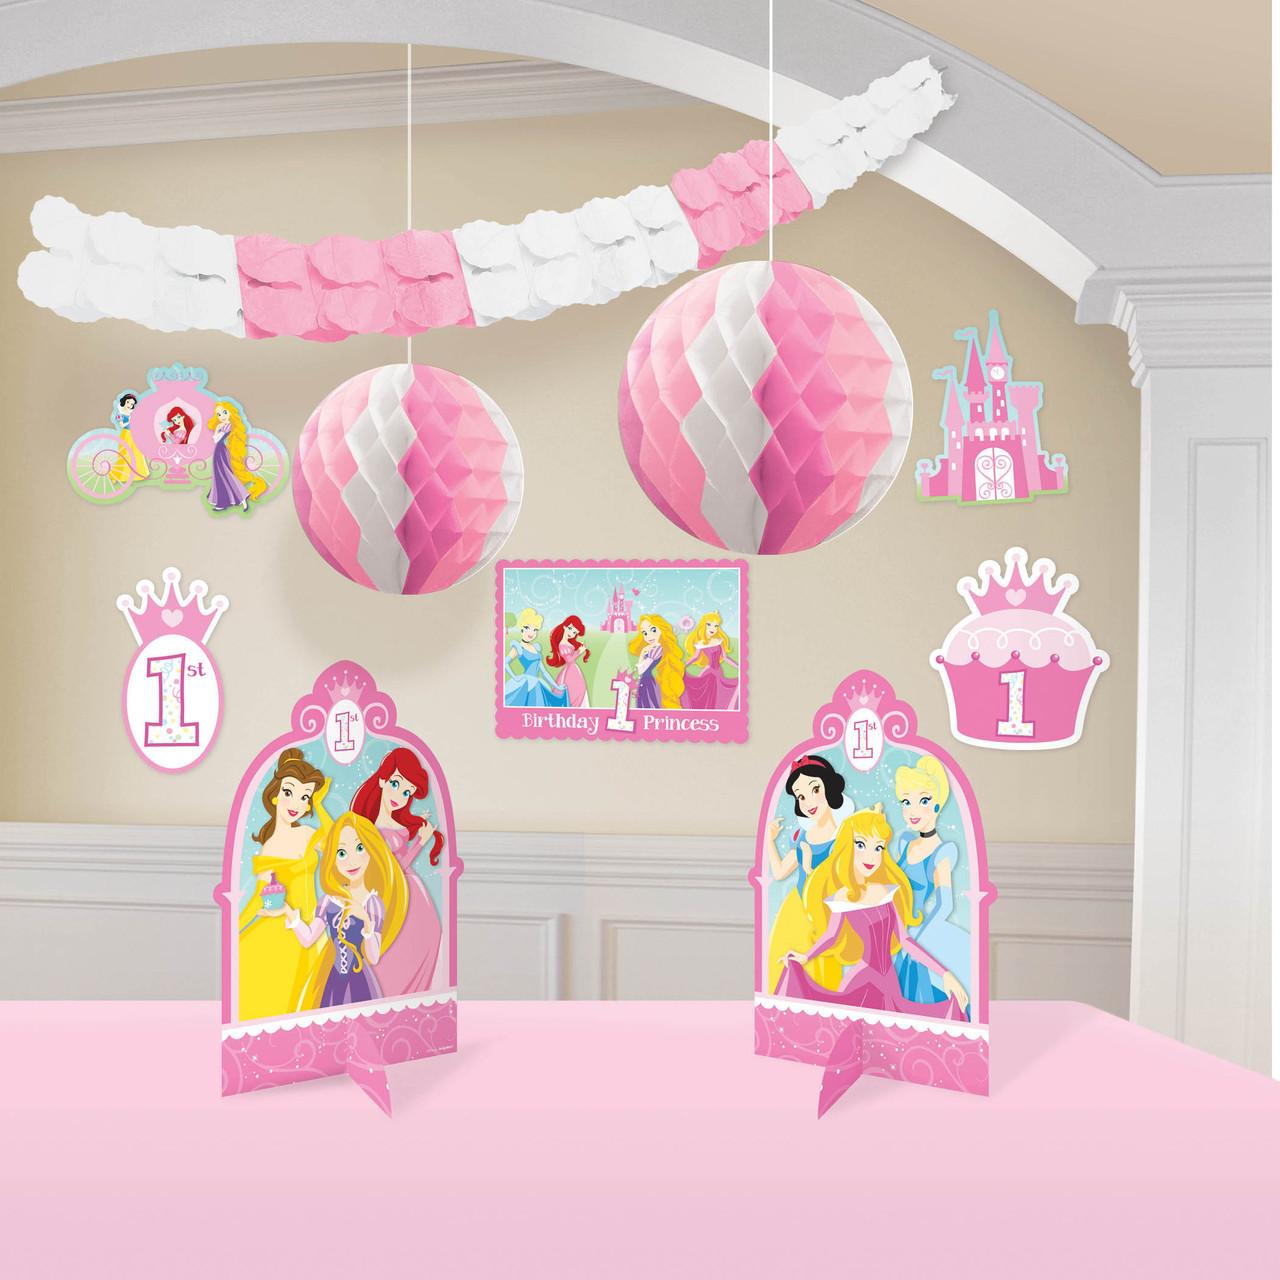 Disney Princess 1st Birthday Decorating Kit